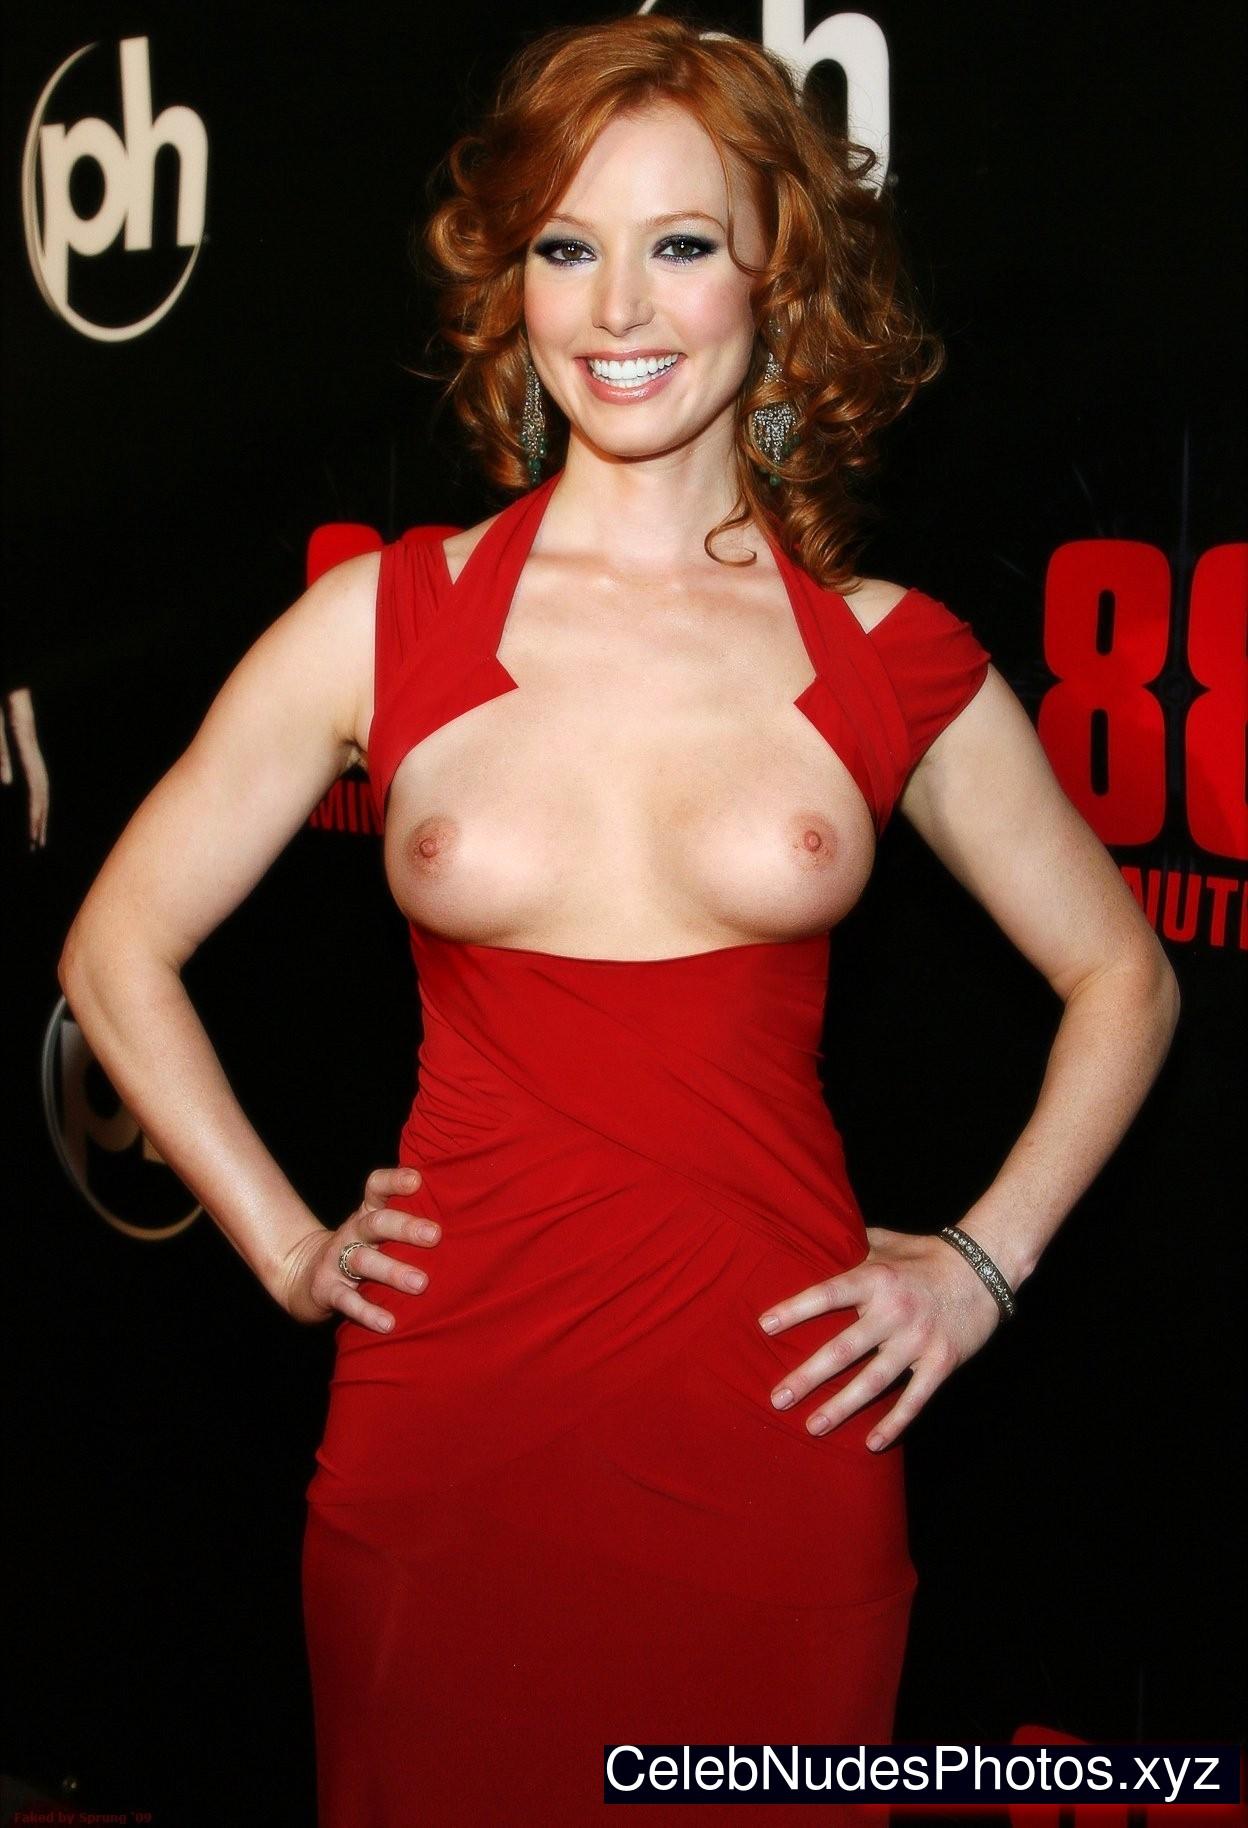 Alicia Witt celeb nude